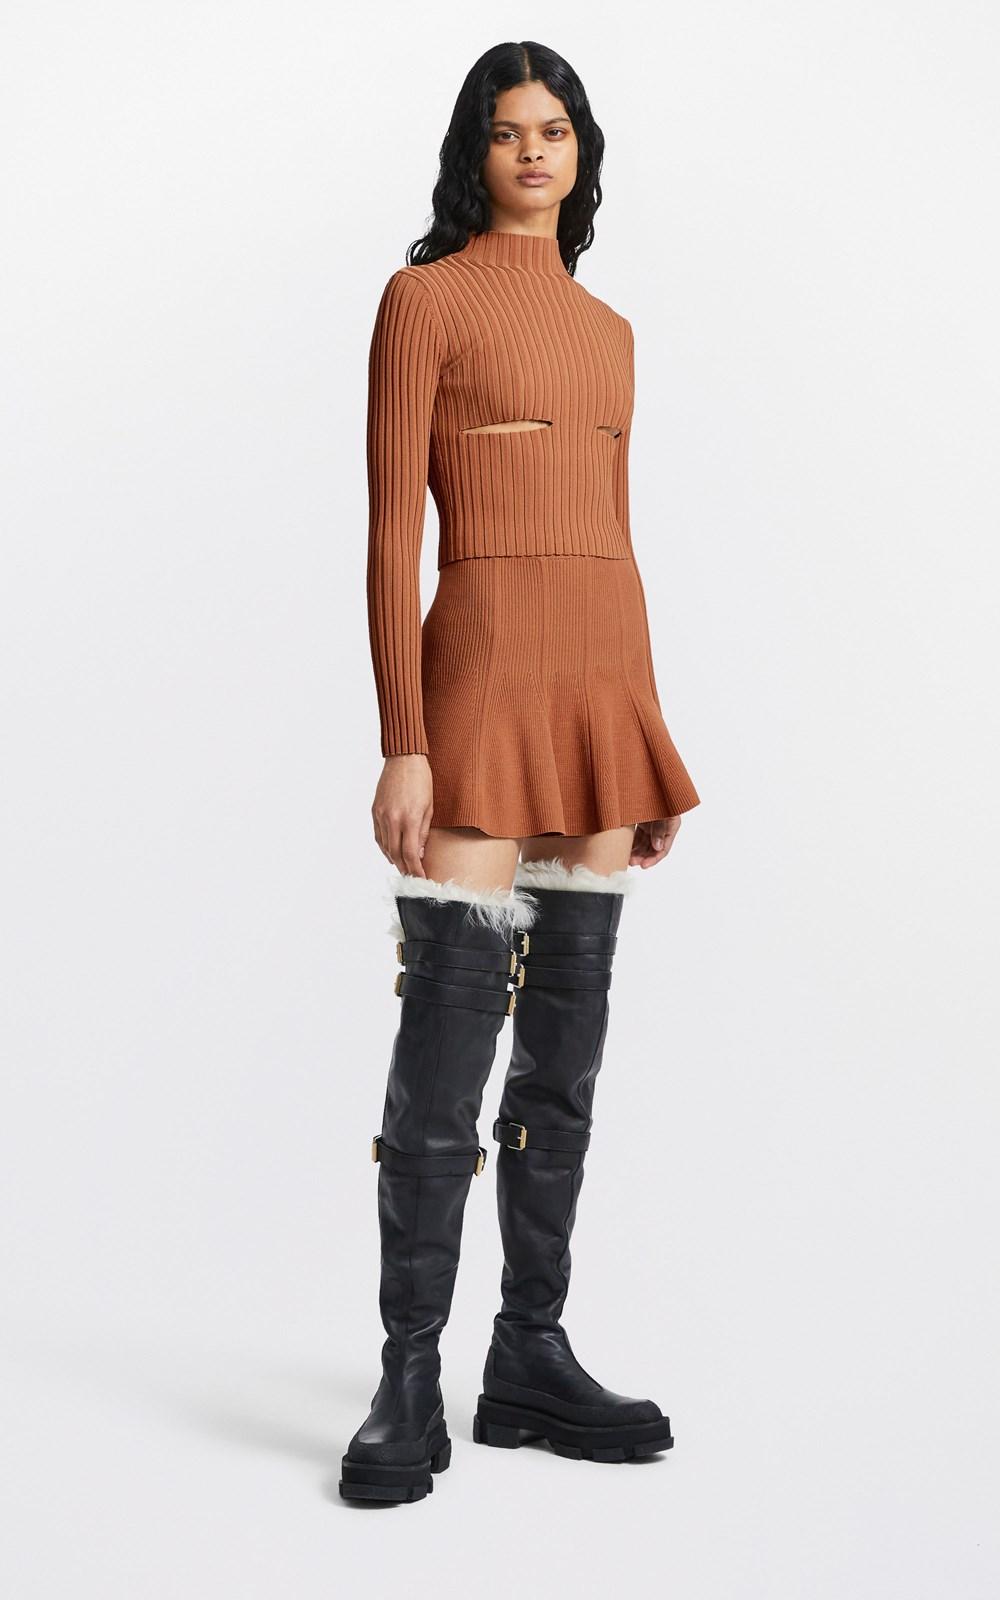 Skirts | CORSET FLARE SKIRT